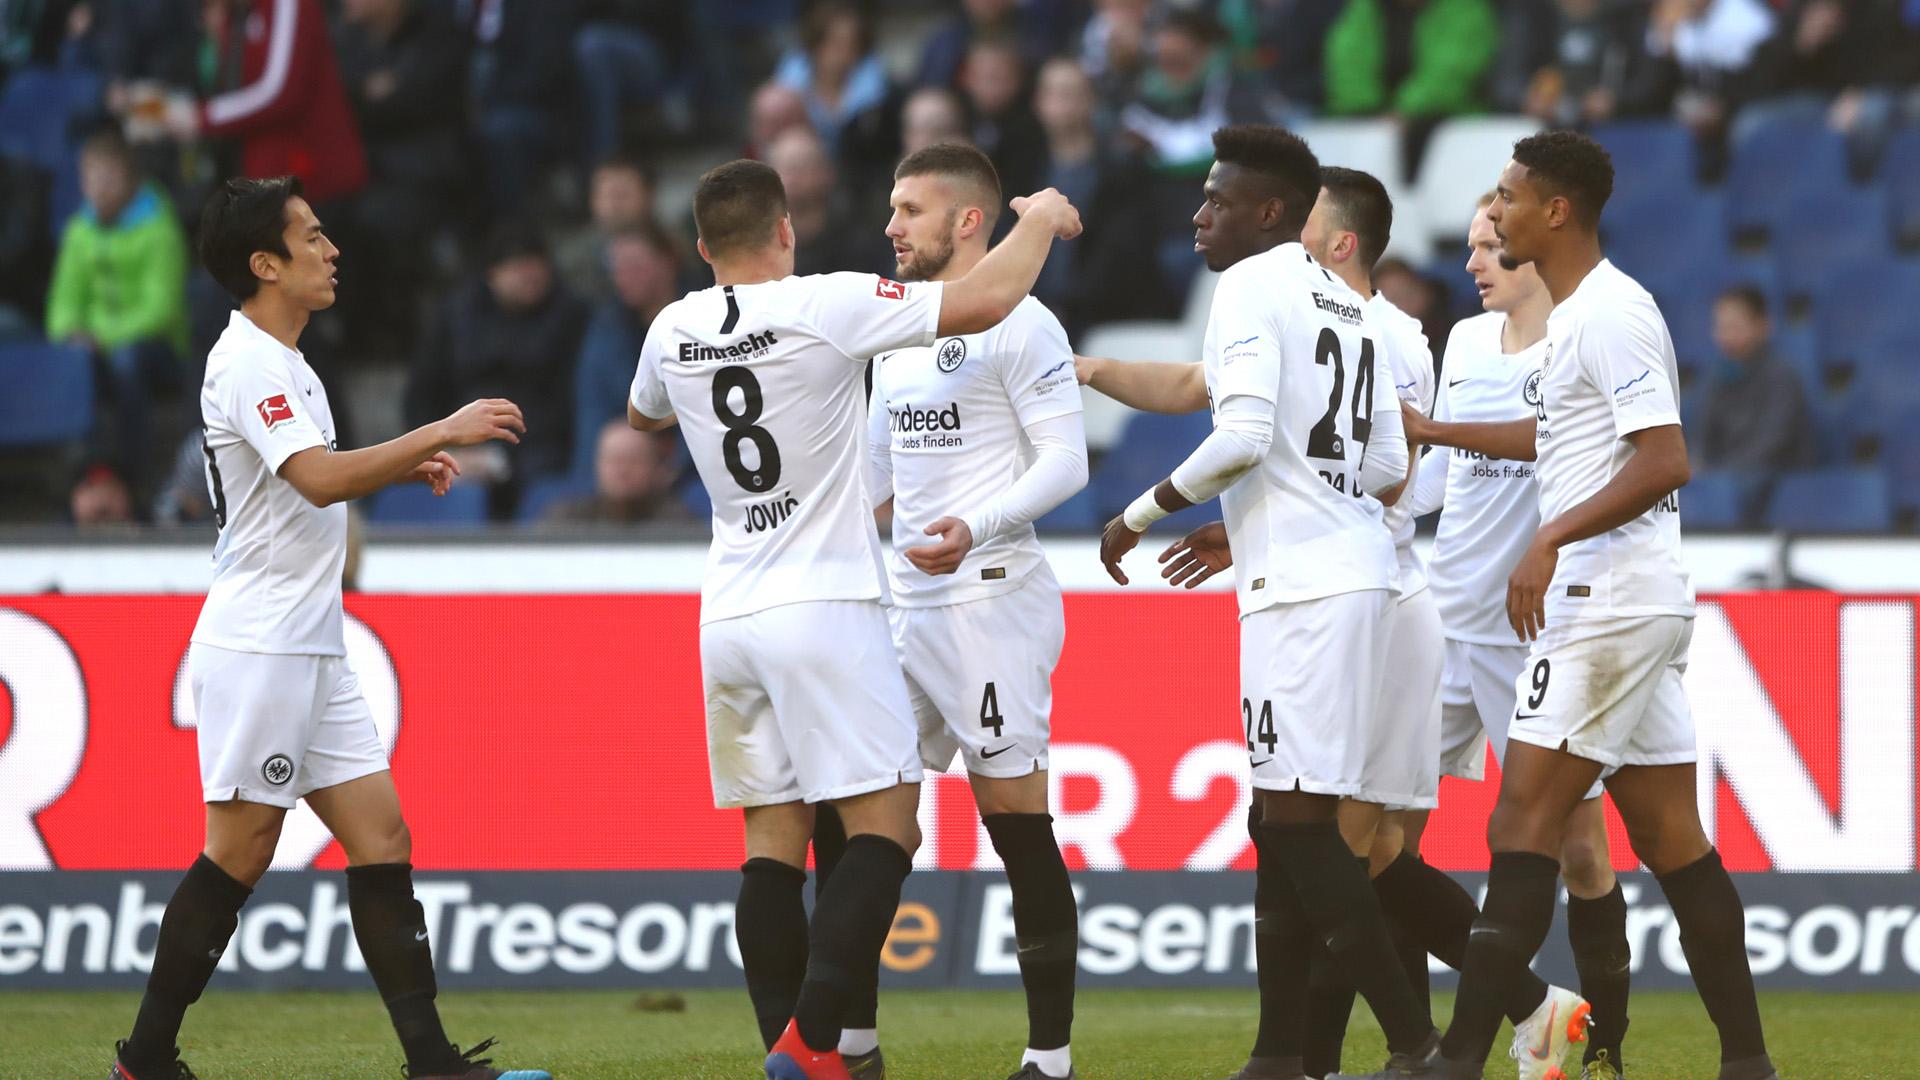 Inter Vs Frankfurt Wallpaper: Wer Zeigt / überträgt Eintracht Frankfurt Vs. Inter